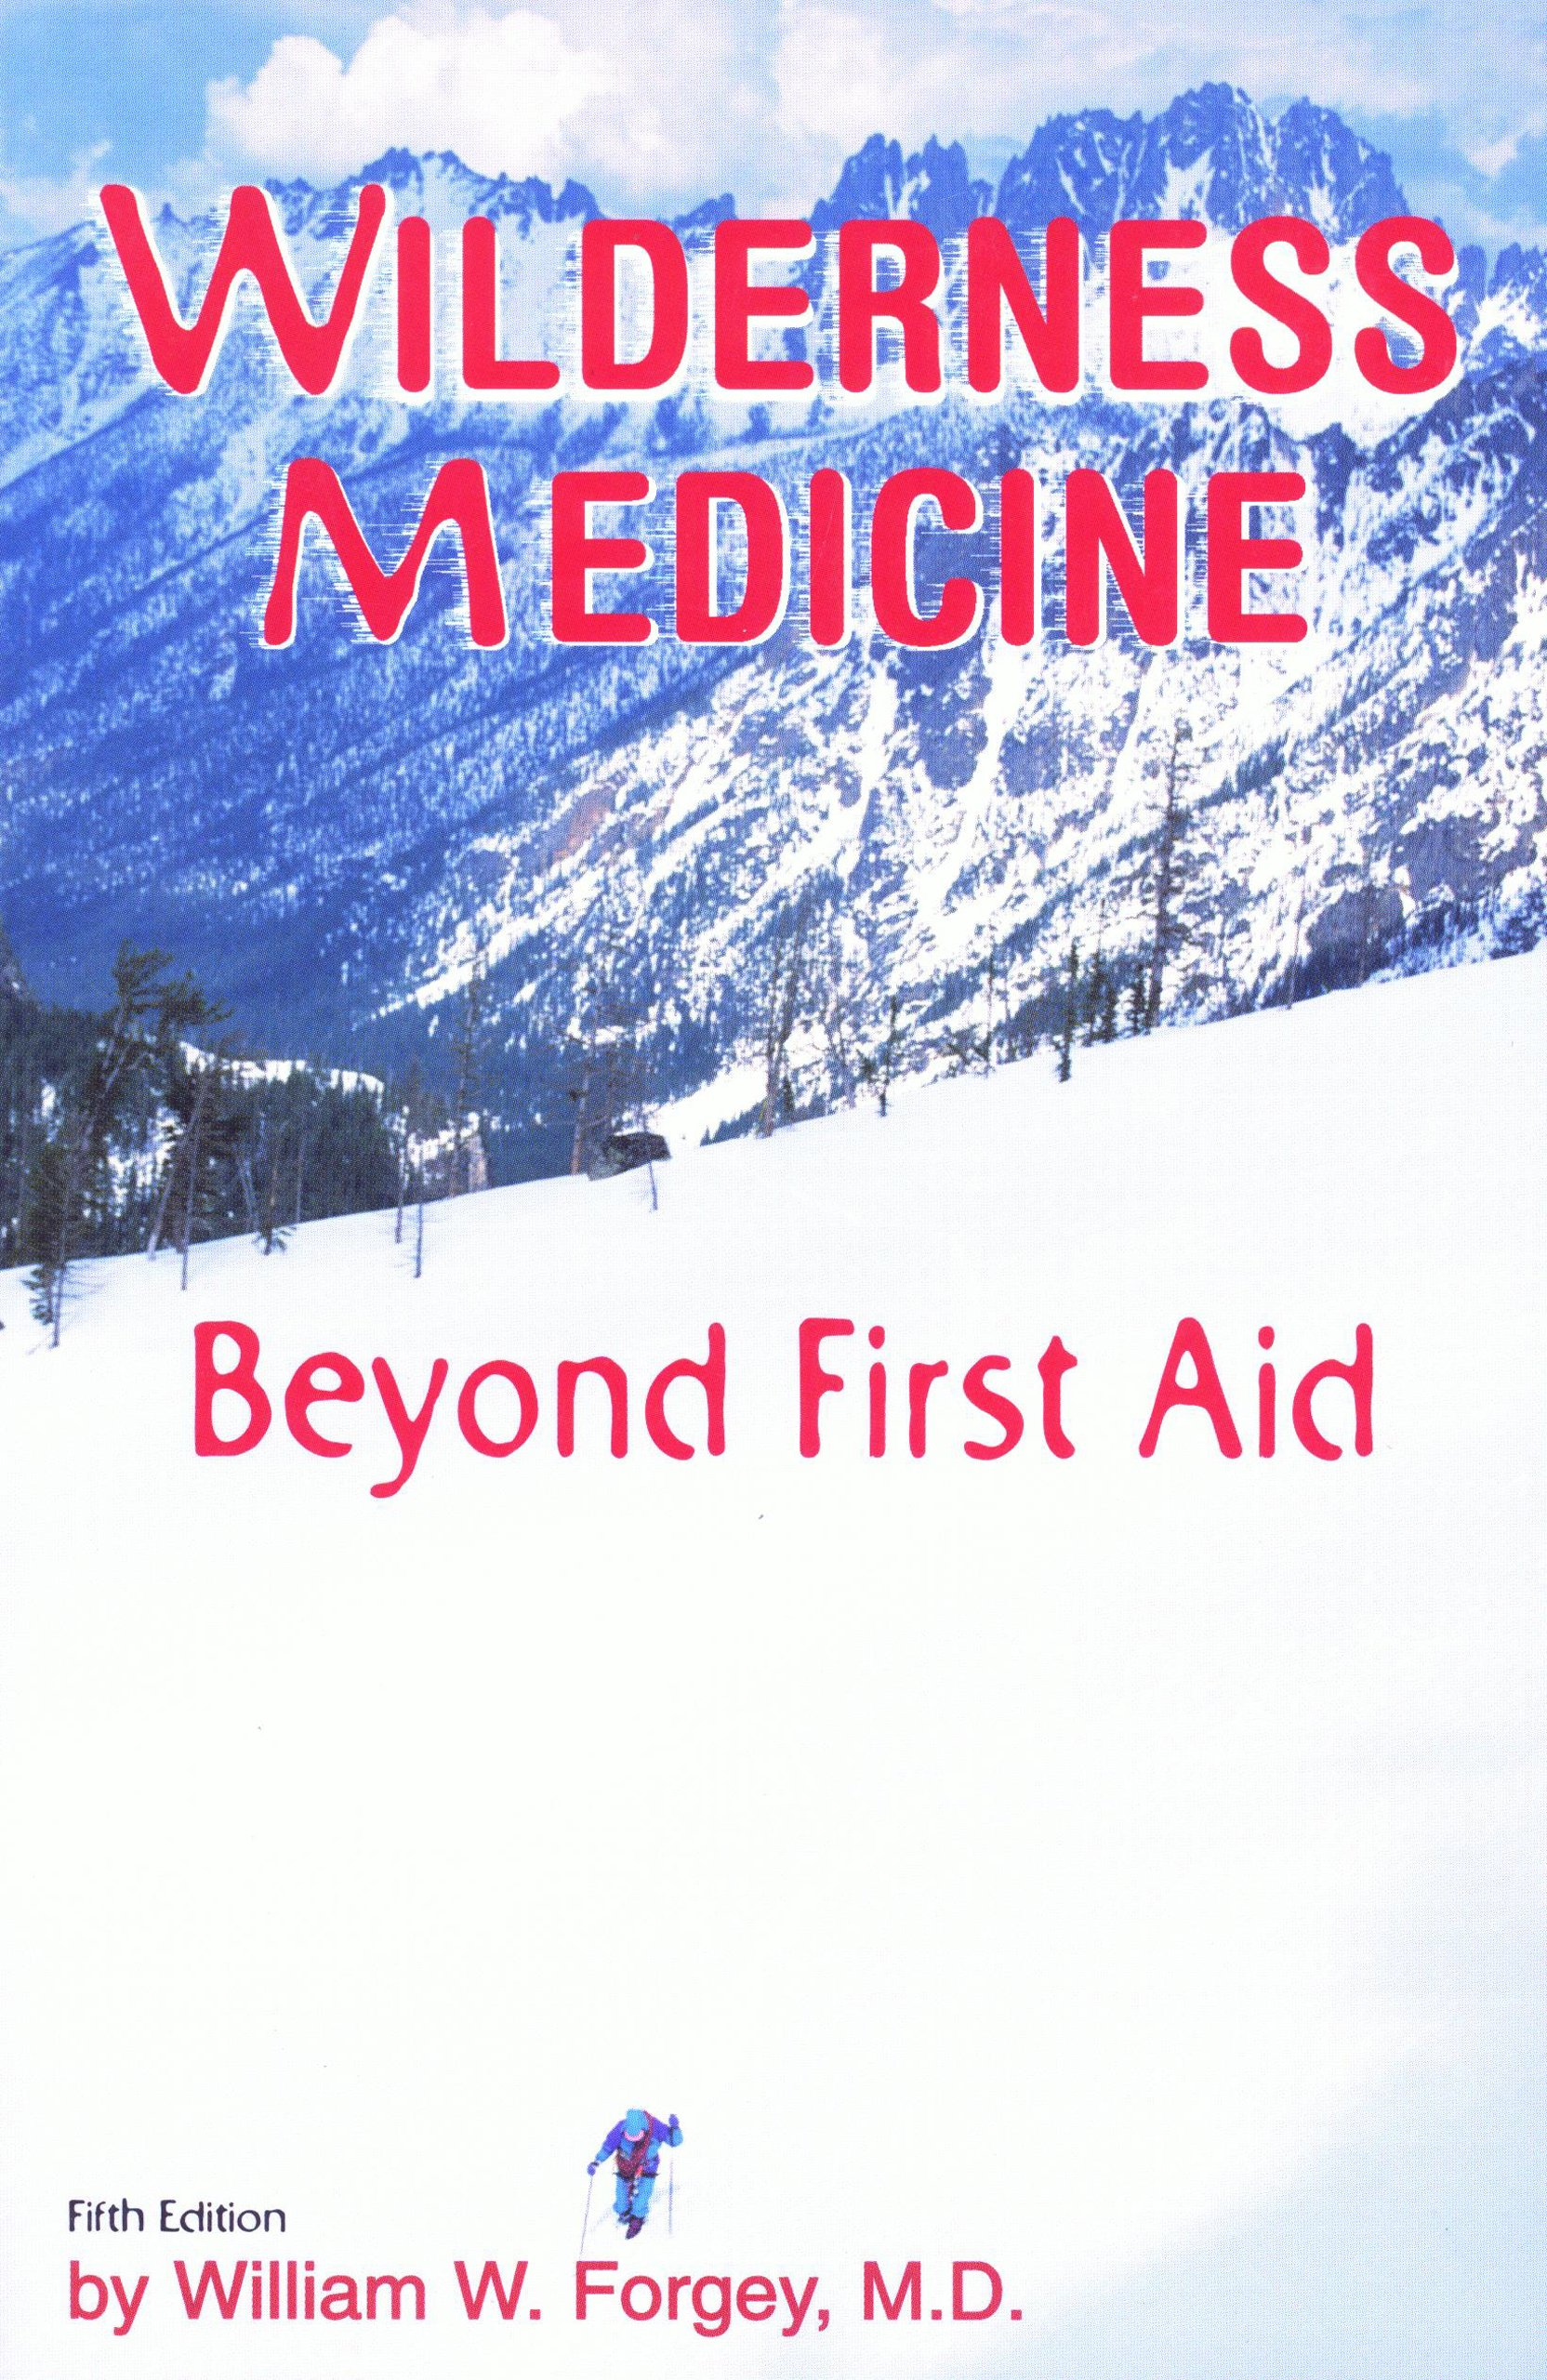 Wilderness Medicine, 5th: Beyond First Aid: Amazon.es: Forgey MD, William W: Libros en idiomas extranjeros